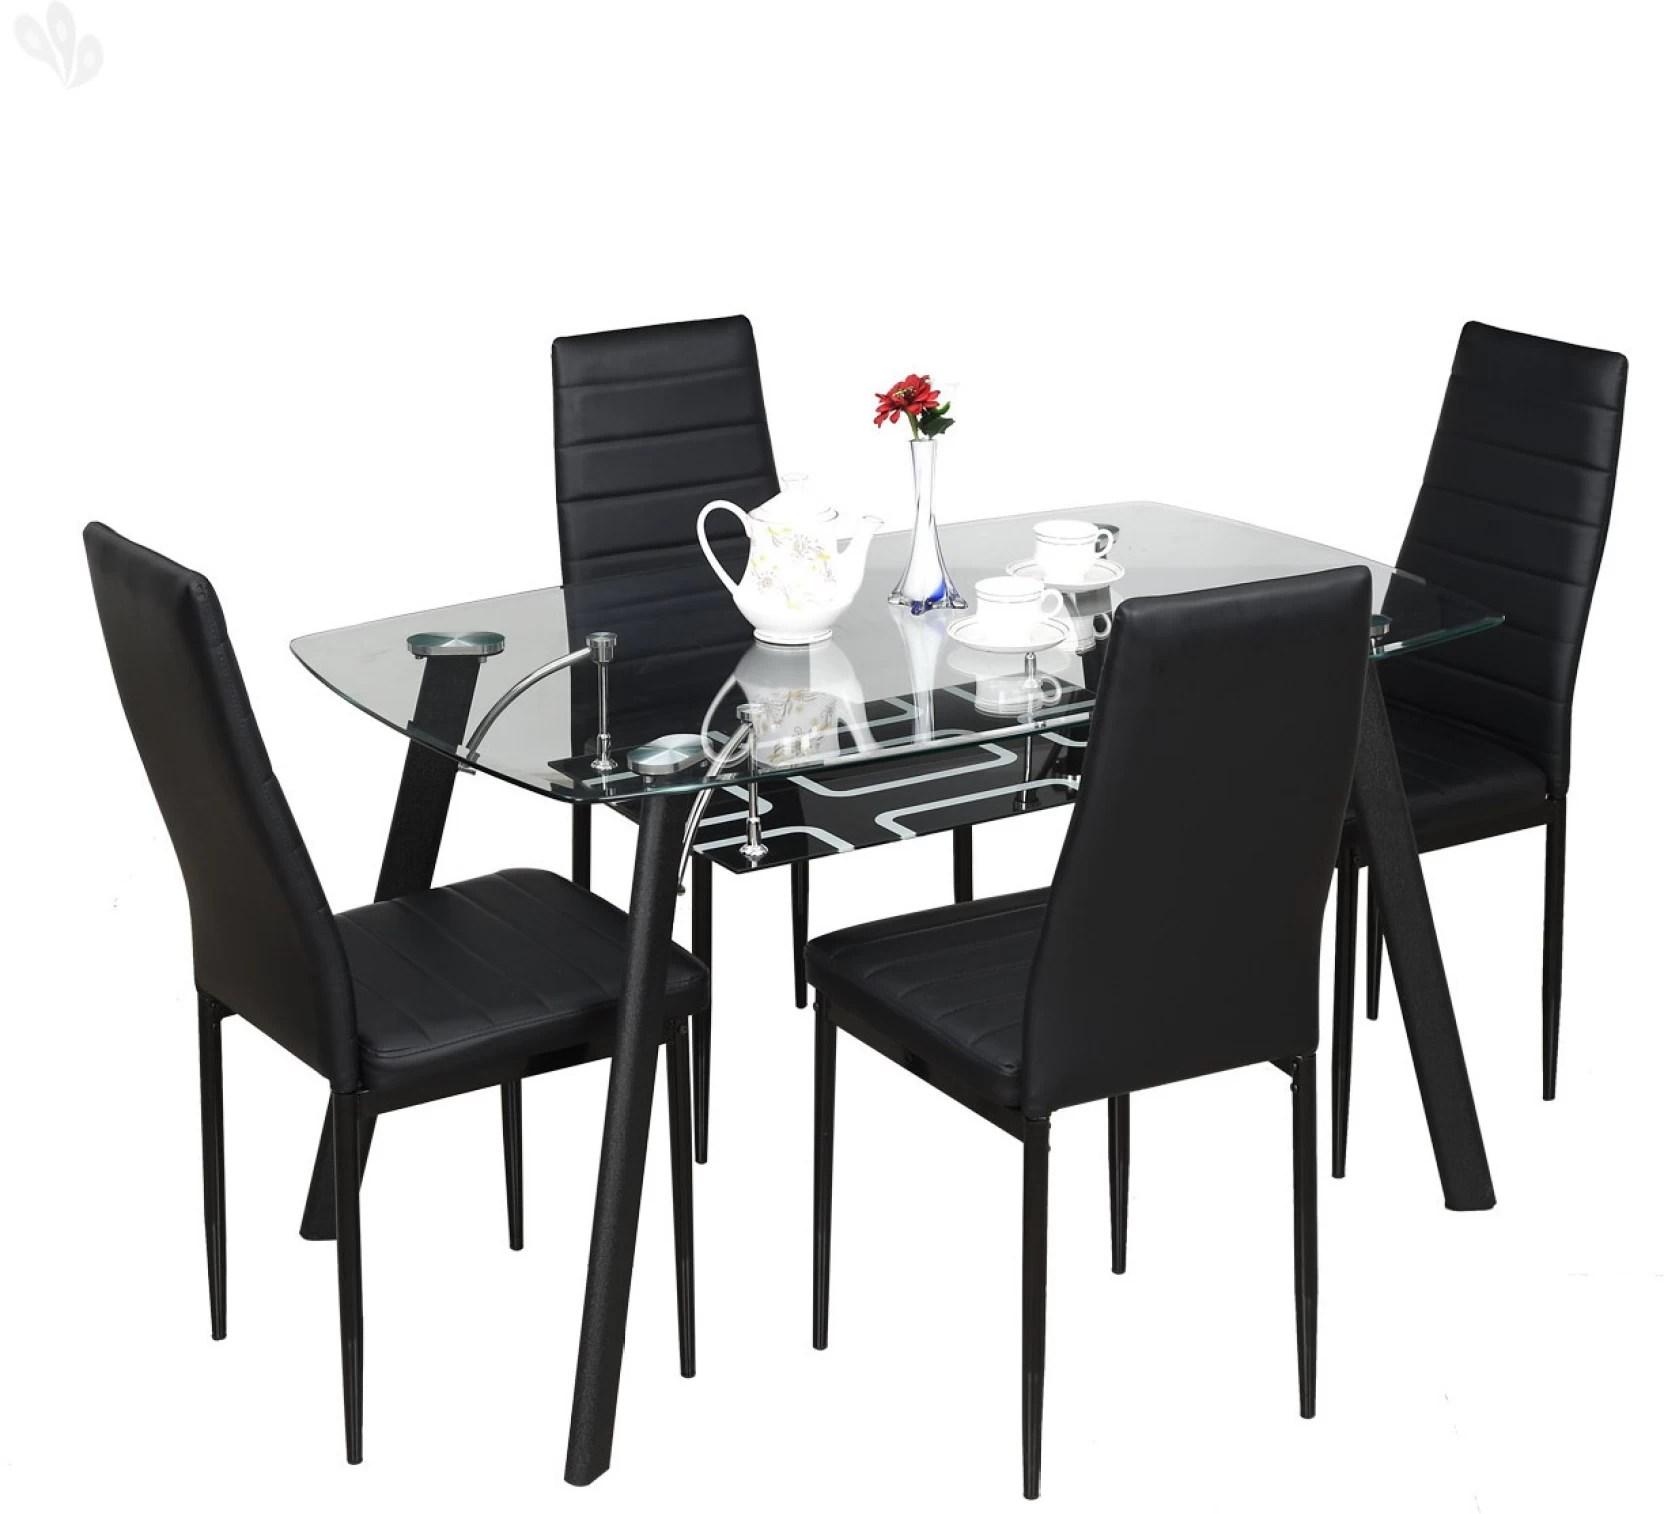 steel chair flipkart ikea kivik covers royal oak milan metal dining set price in india buy